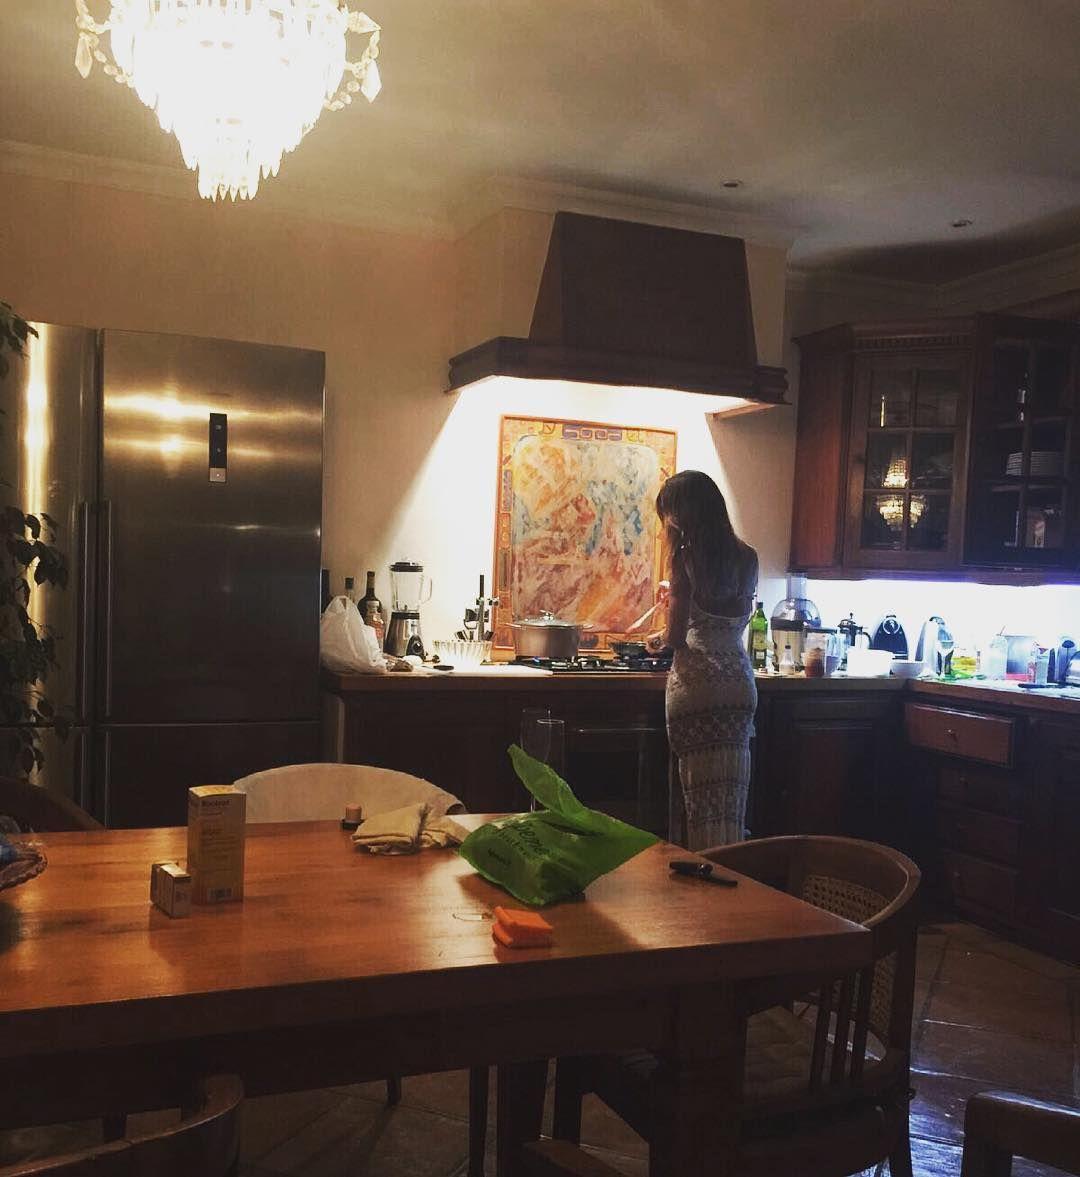 La cocinerita• 😃😃😃 #mmmhhhh